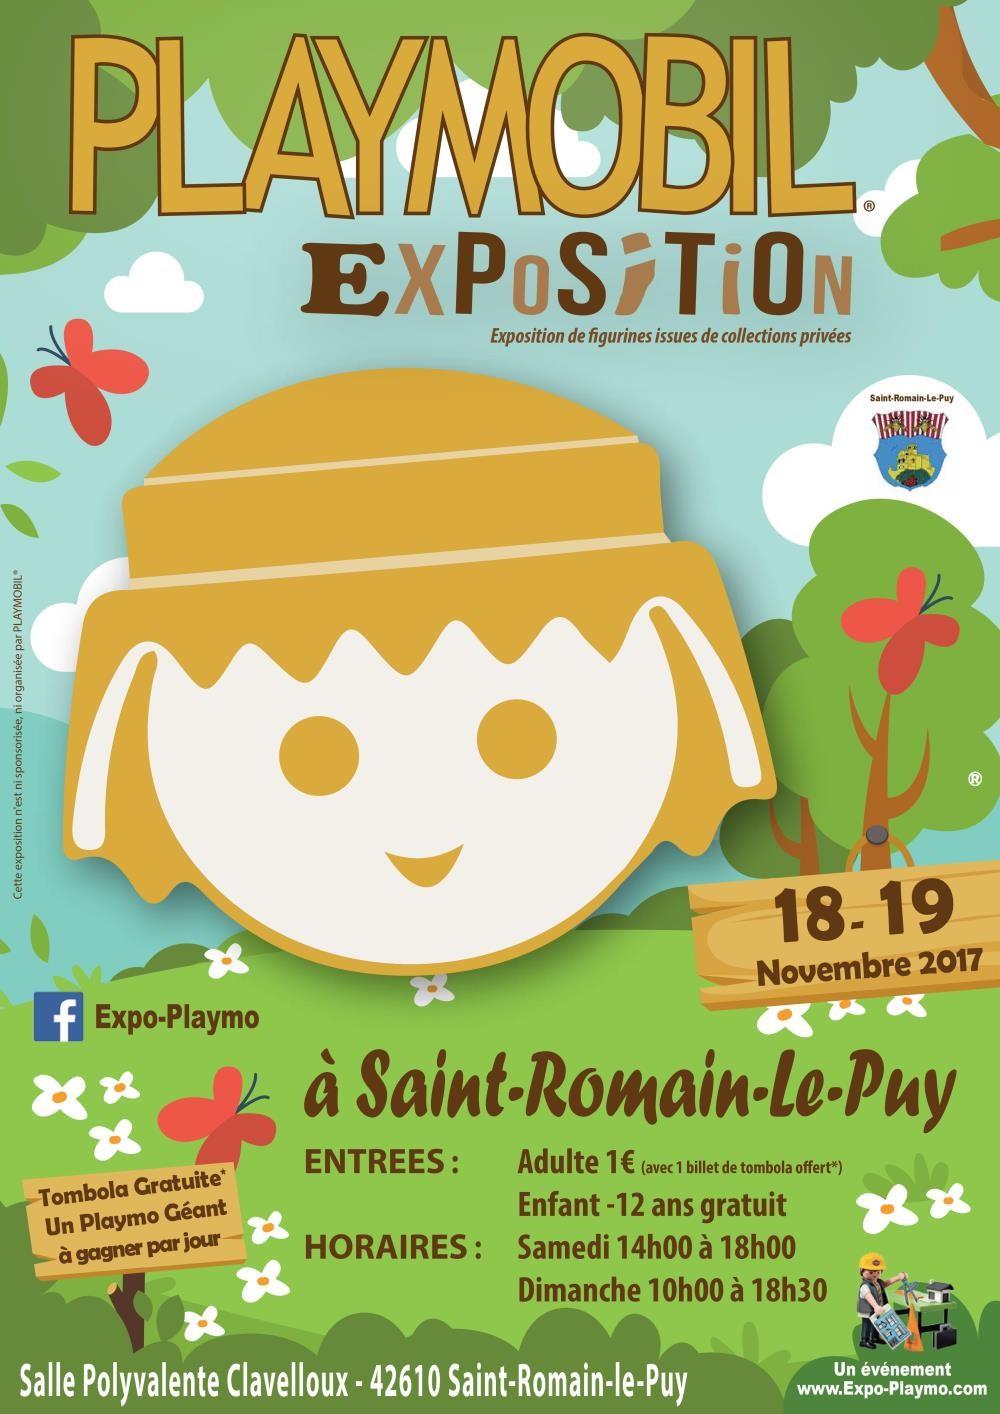 Exposition playmobil saint romain le puy expo playmo web